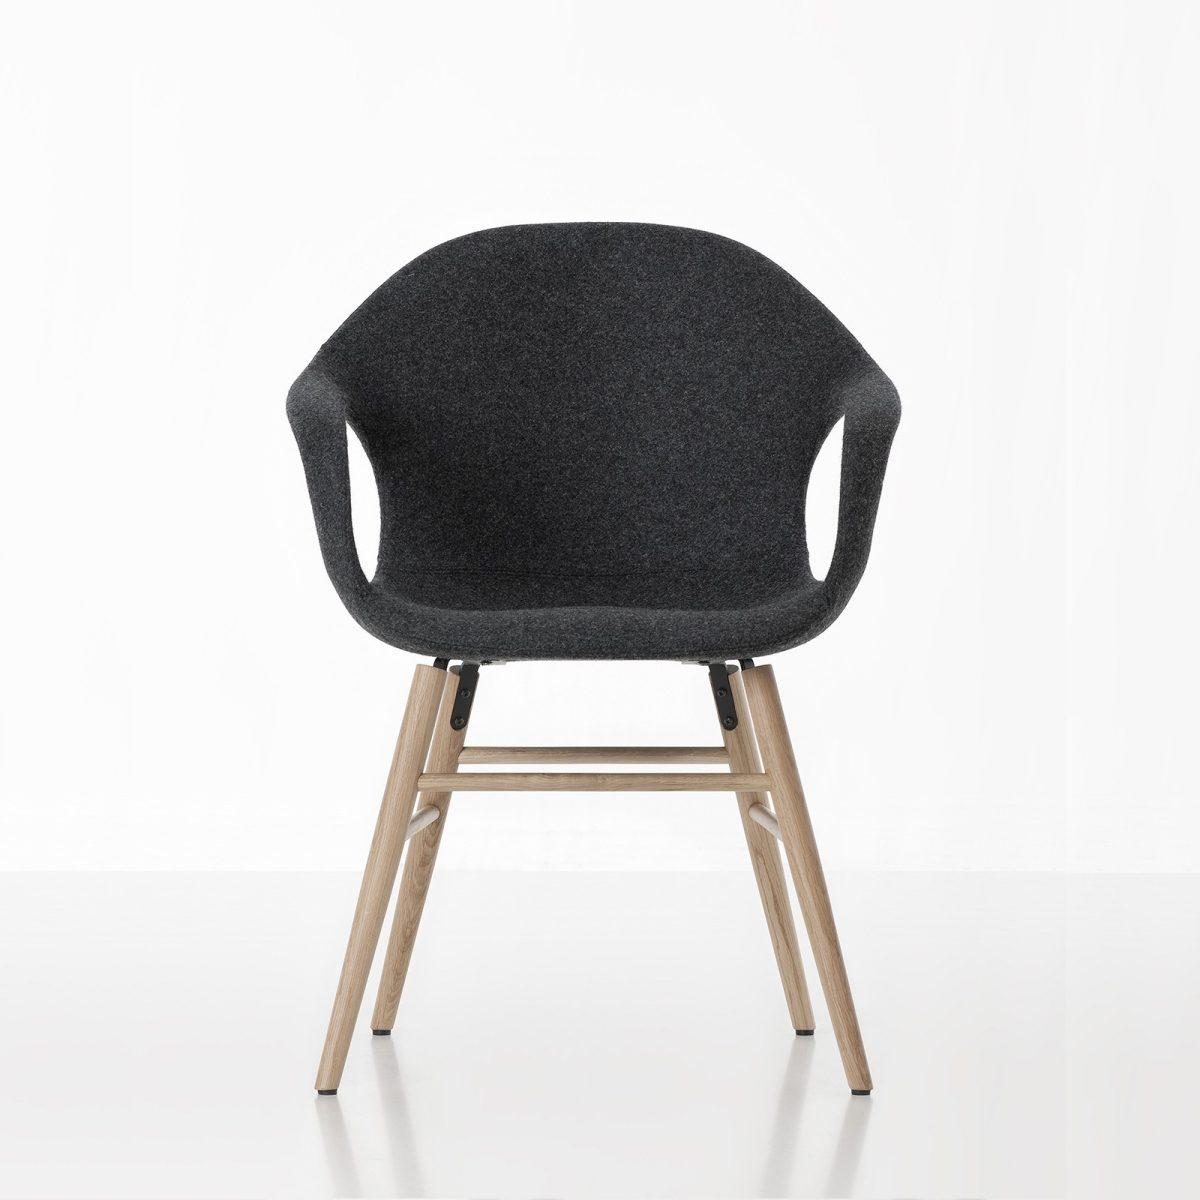 Möbel - Stühle - Elephant Wood Sessel - Kristalia - scwarz - Buchenfurnier, lackiertes Polyurhethan